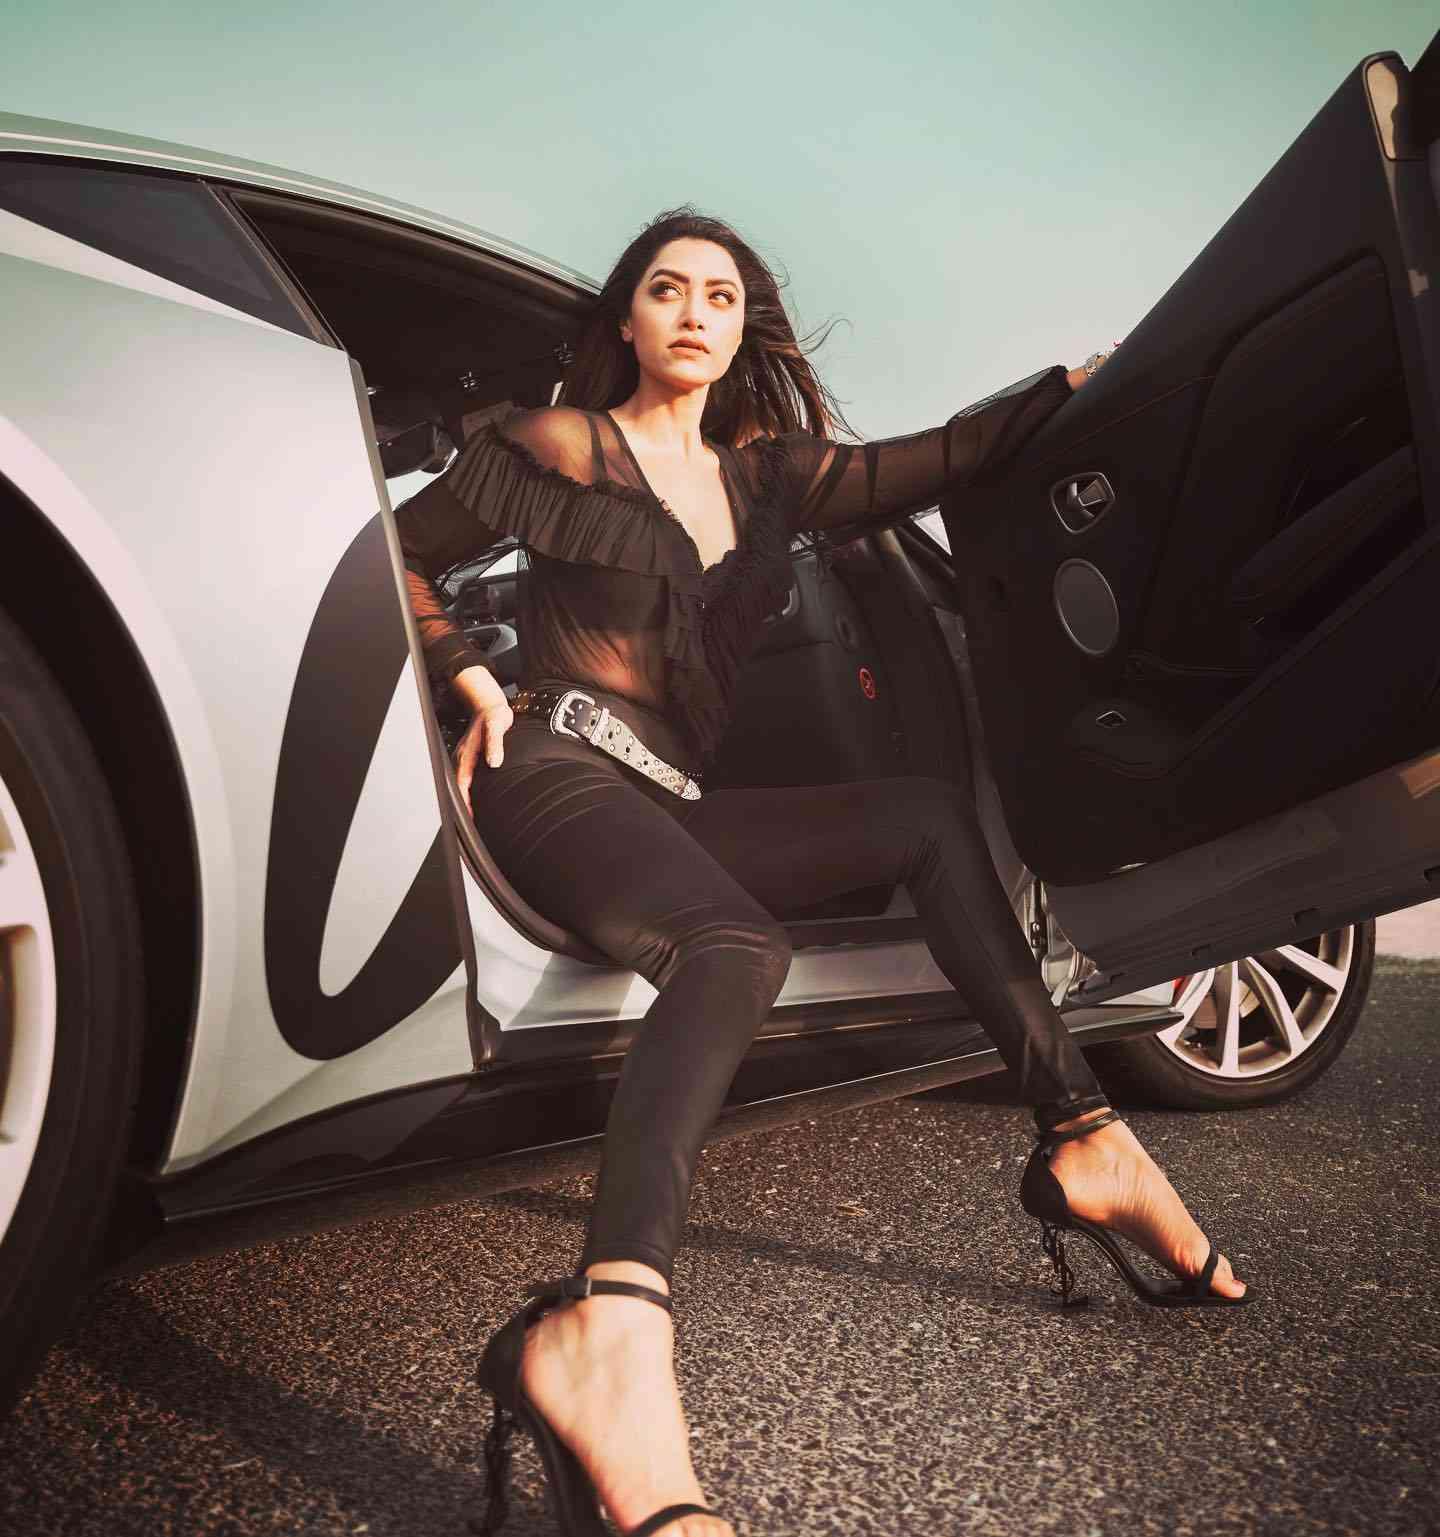 Mallu Actress Mamta Mohandas Latest Gorgeous Photoshoot as James Bond 007's Lady